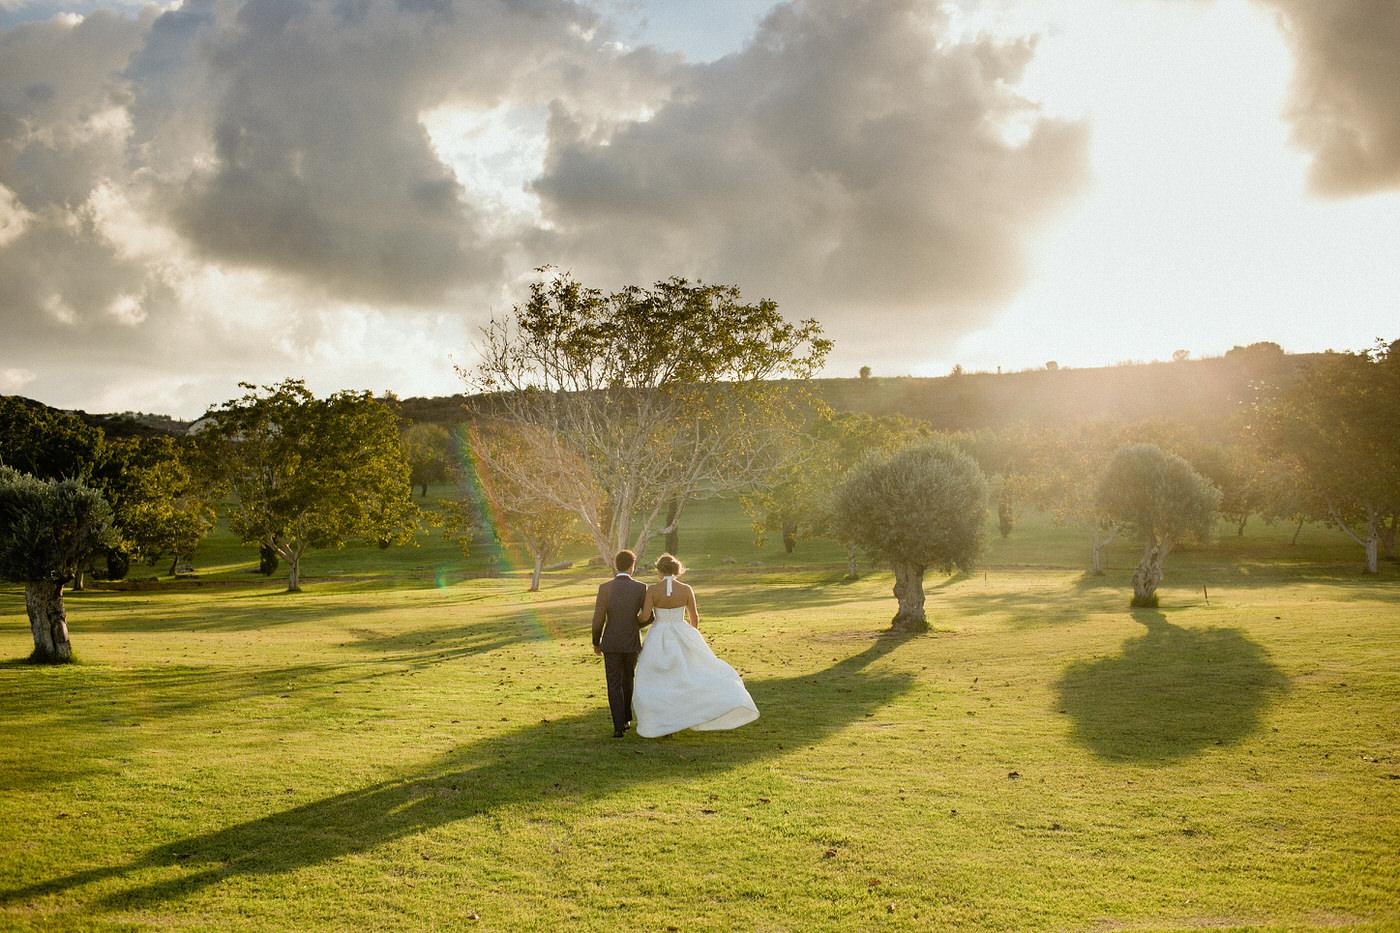 cyprus-wedding-photographer-34.JPG